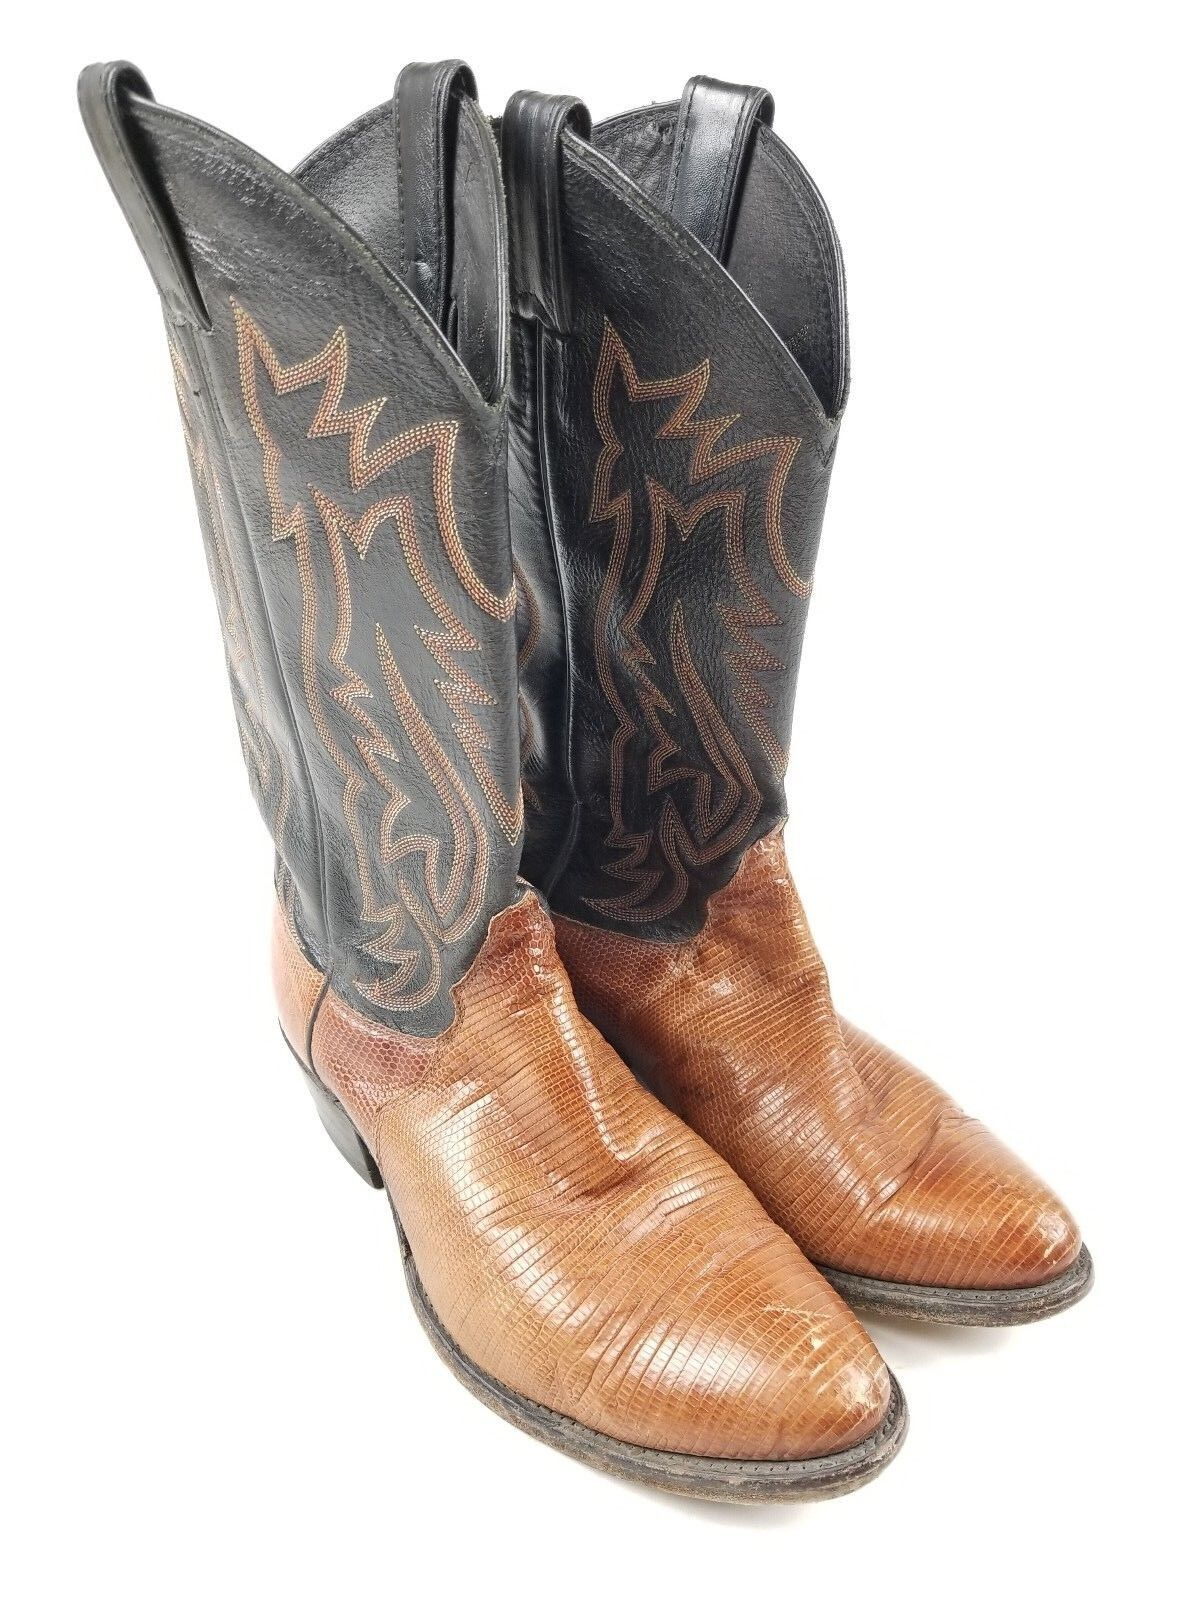 Justin Boots 9312 Peanut Brittle Iguana Lizard Leather Western Men's Size 8 EE